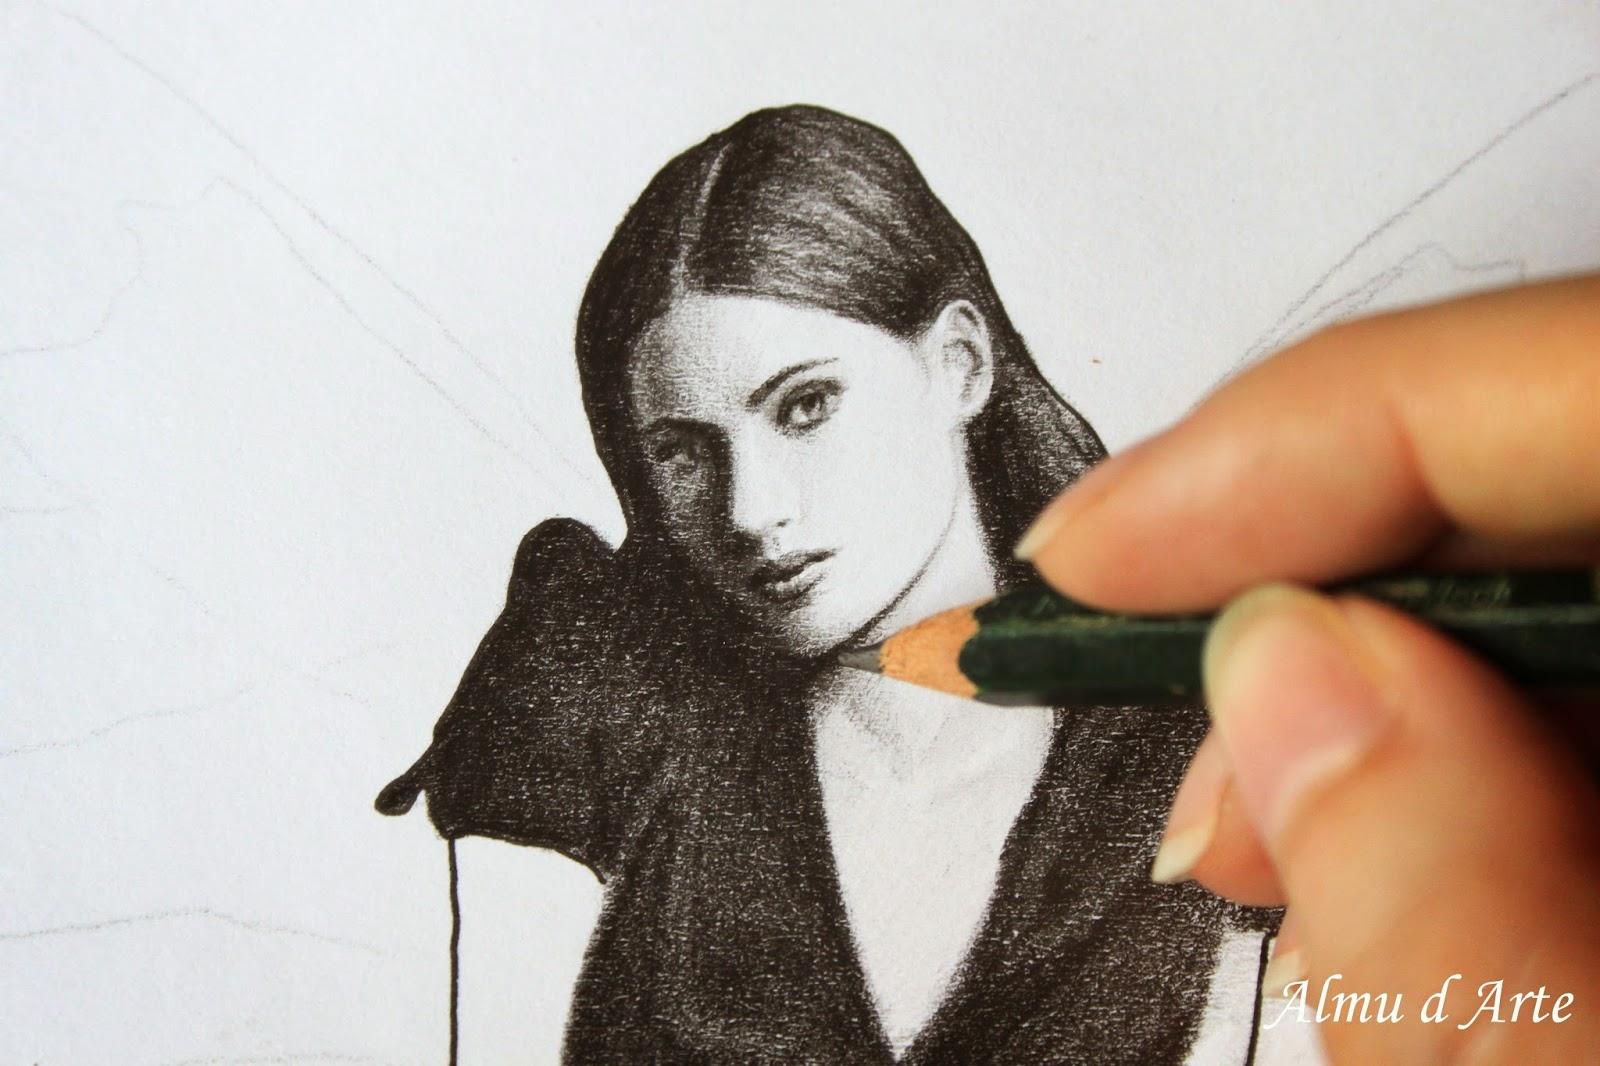 Retrato femenino a lápiz y tinta